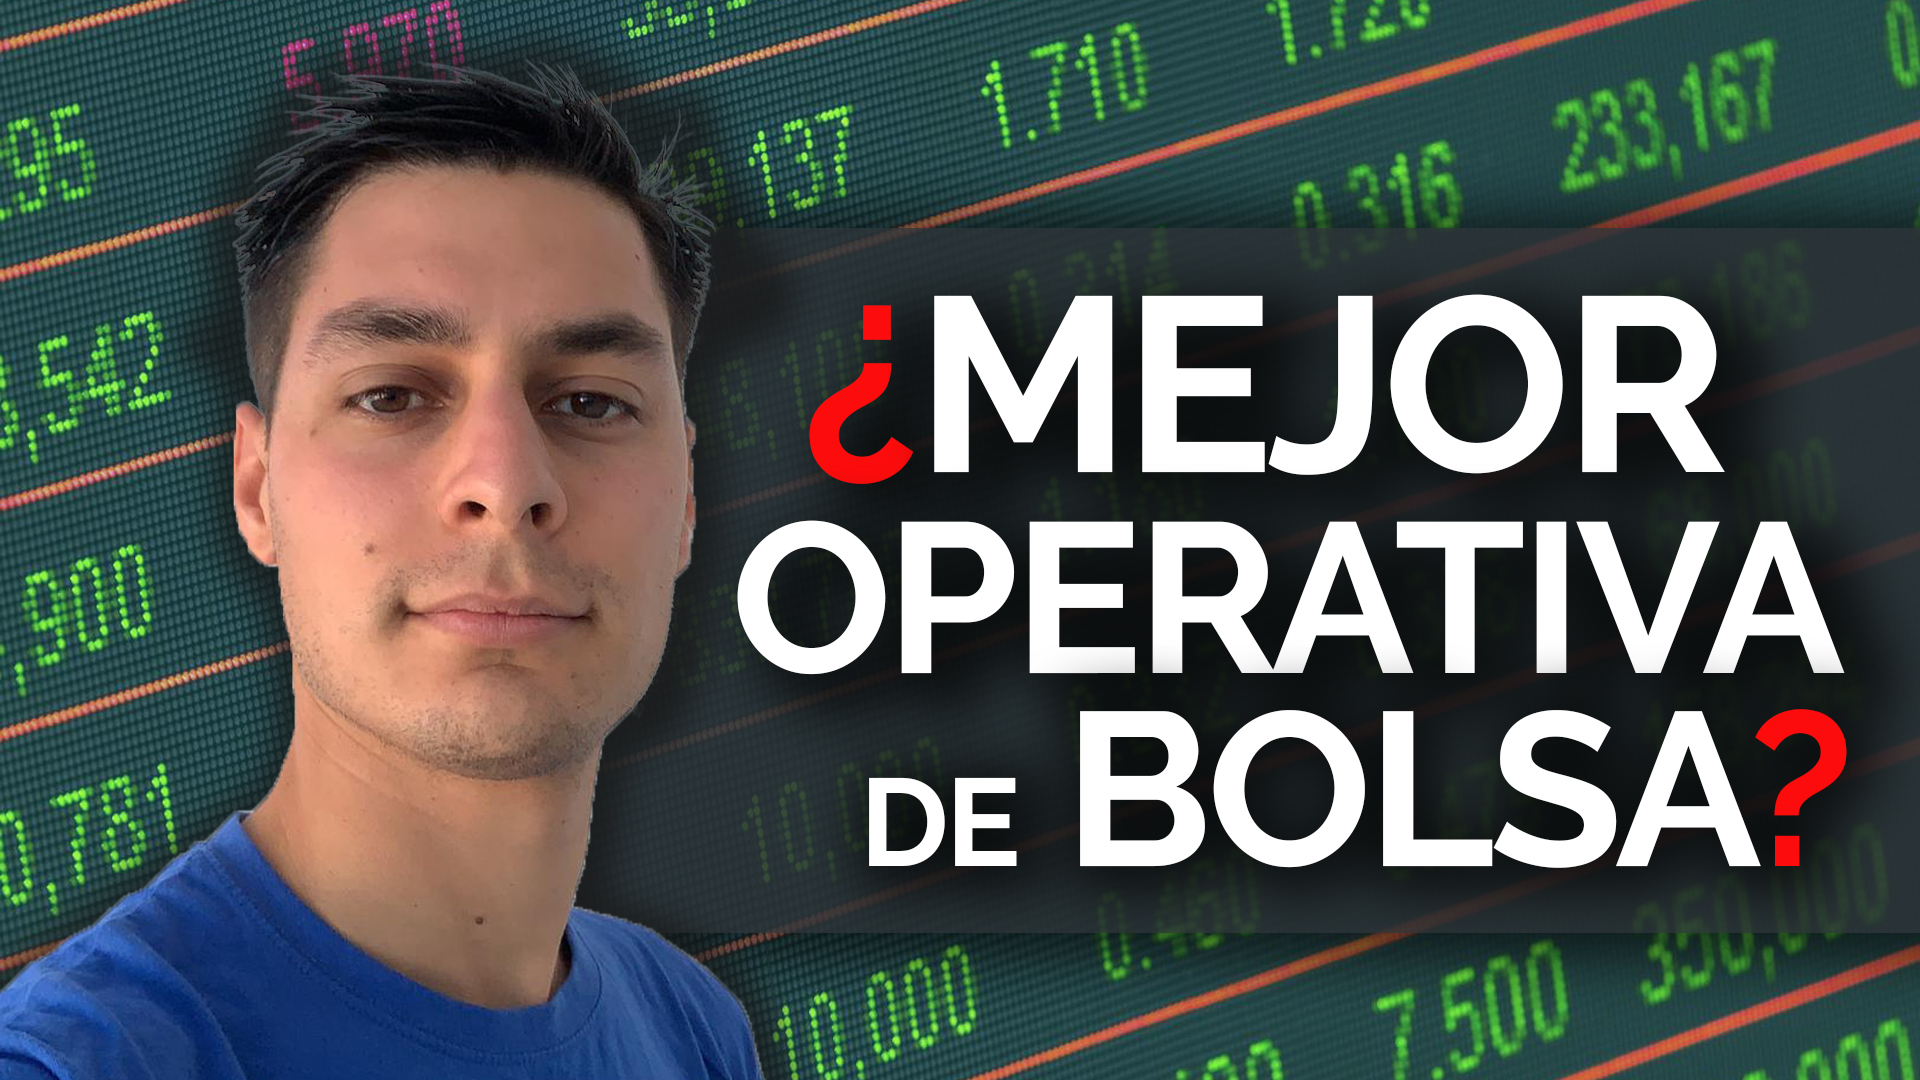 ¿Cuál Es La Mejor Operativa De Bolsa?